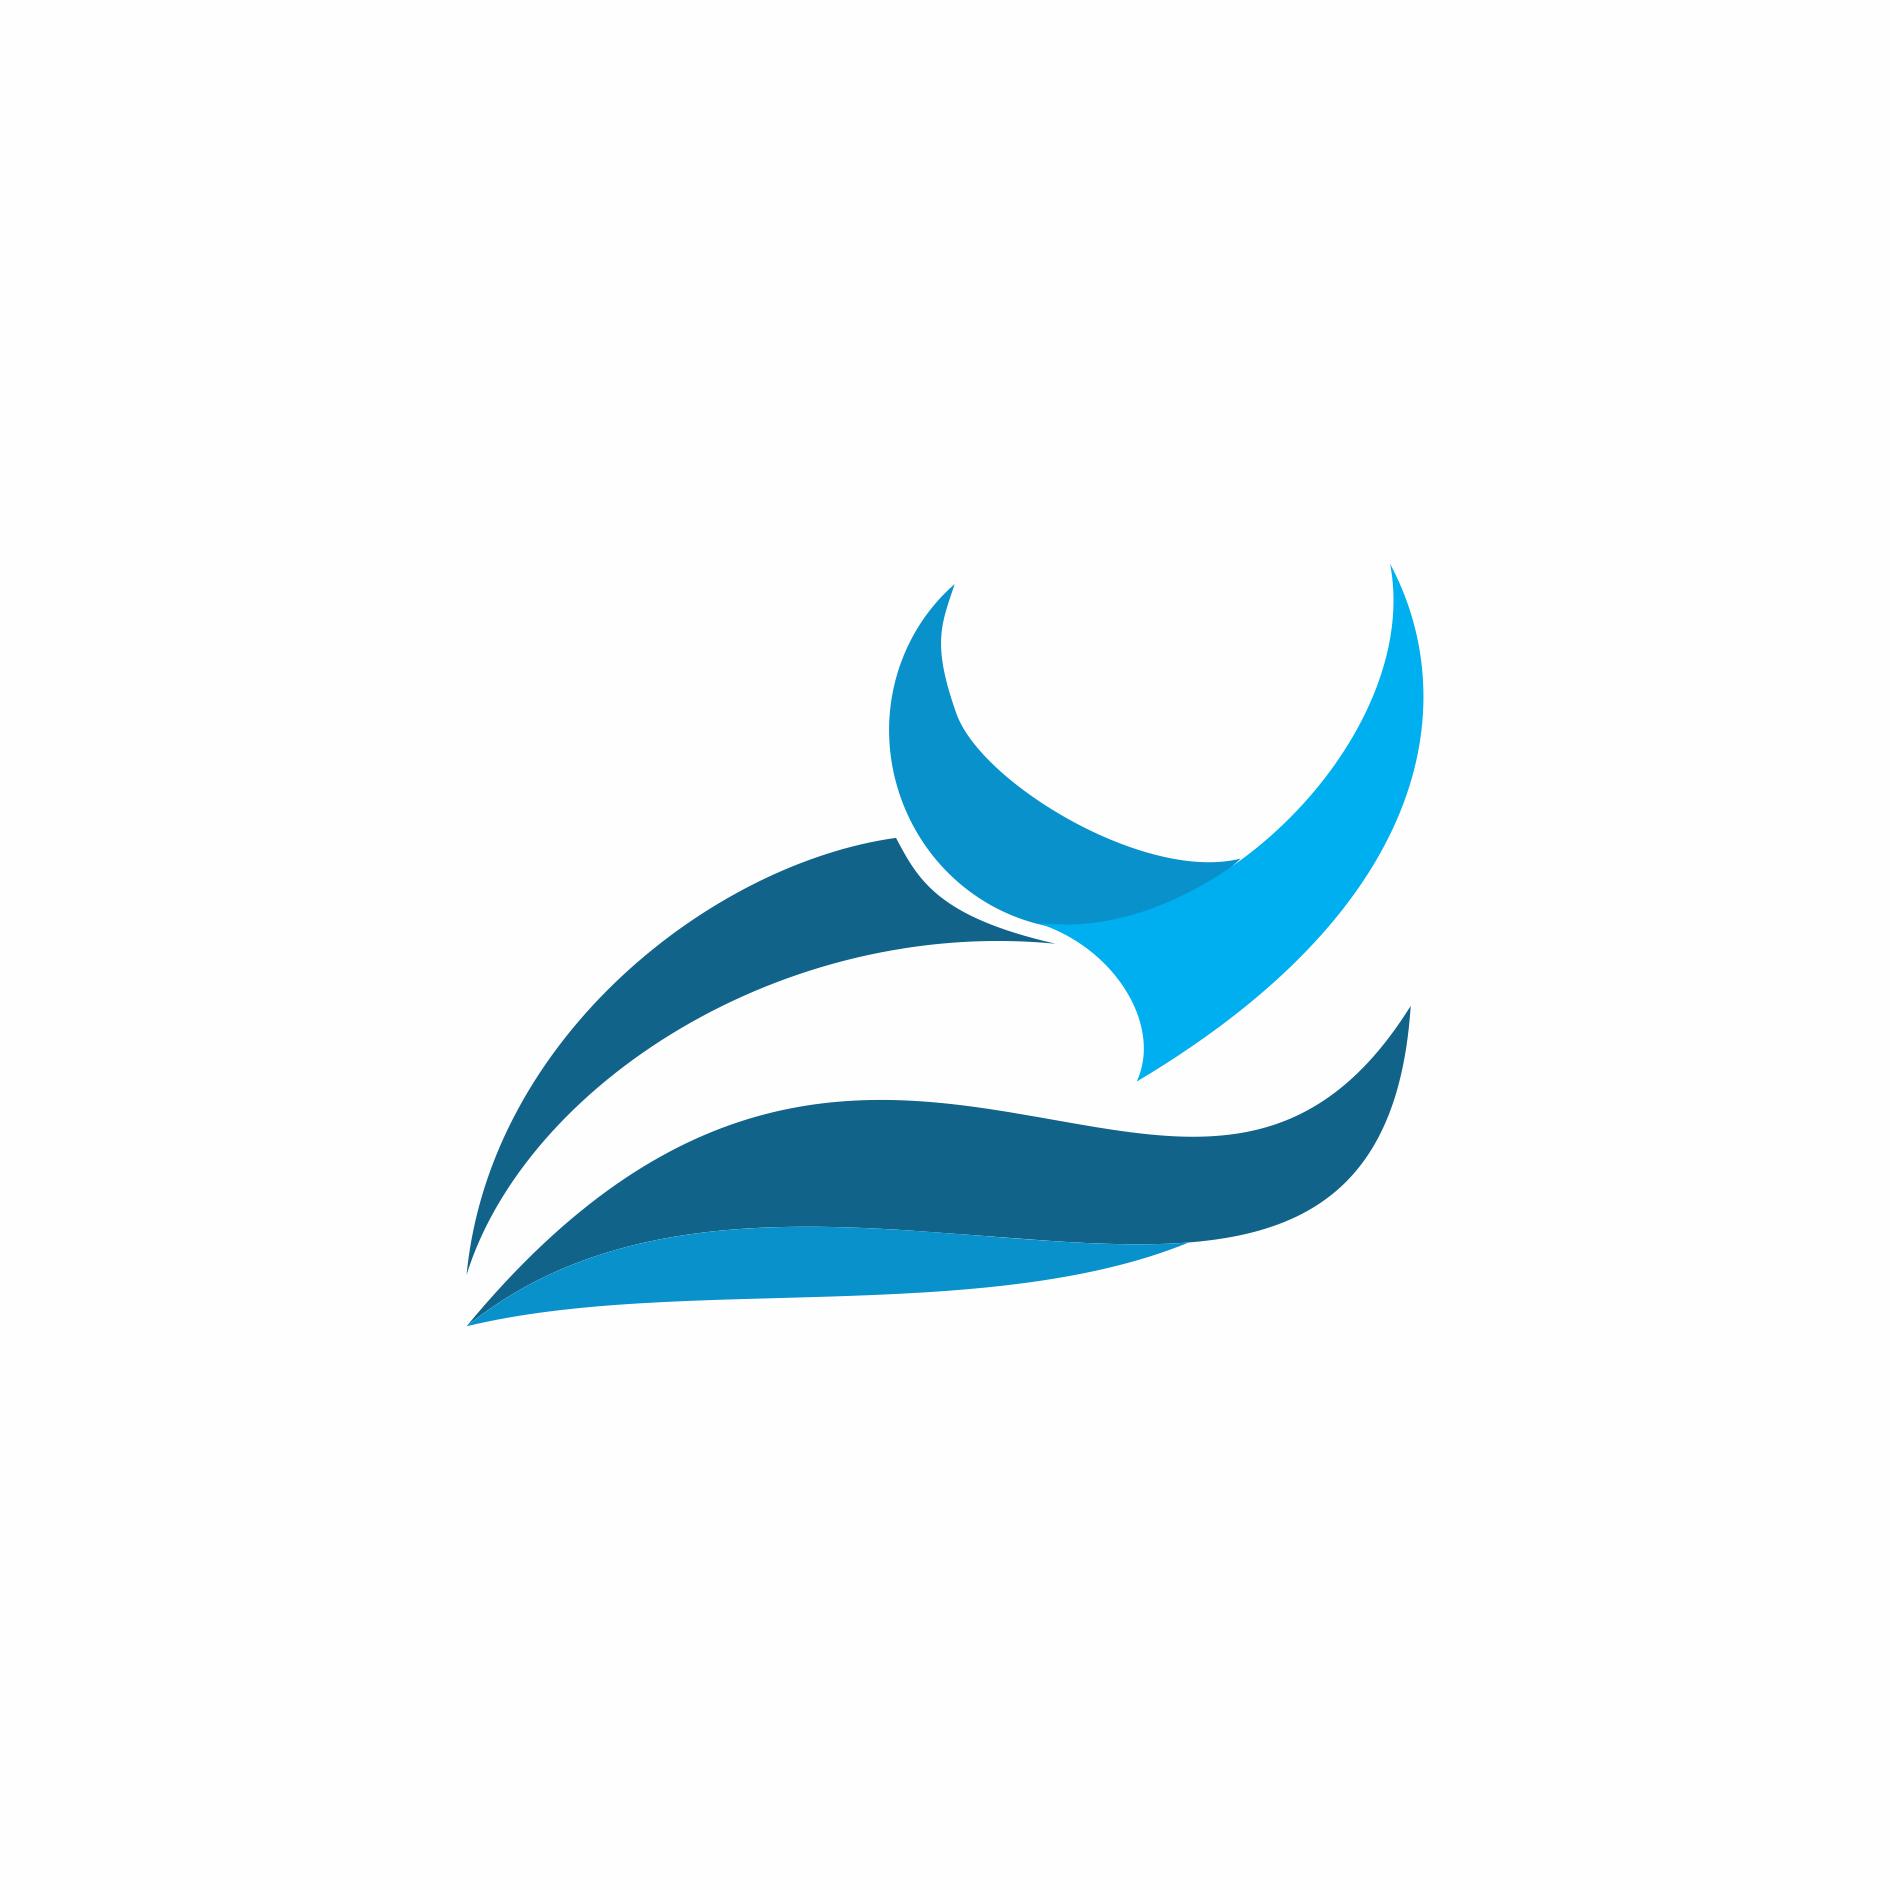 #logo #brand #graphicdesign https://www.facebook.com/vectorux